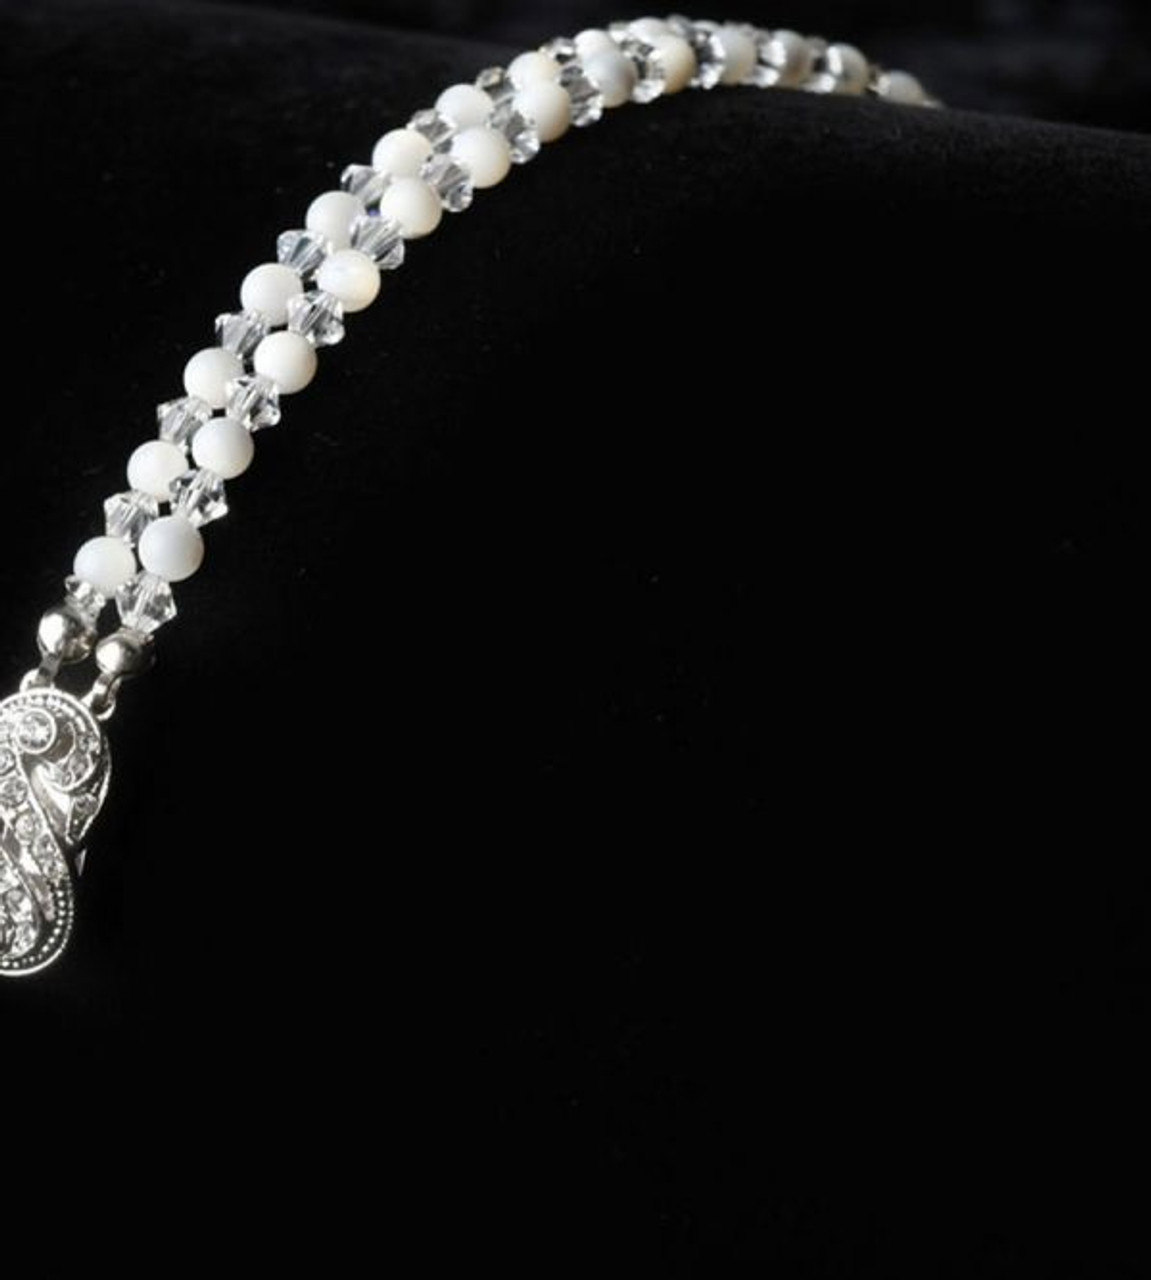 Erica Koesler Bracelet - Style J-9464